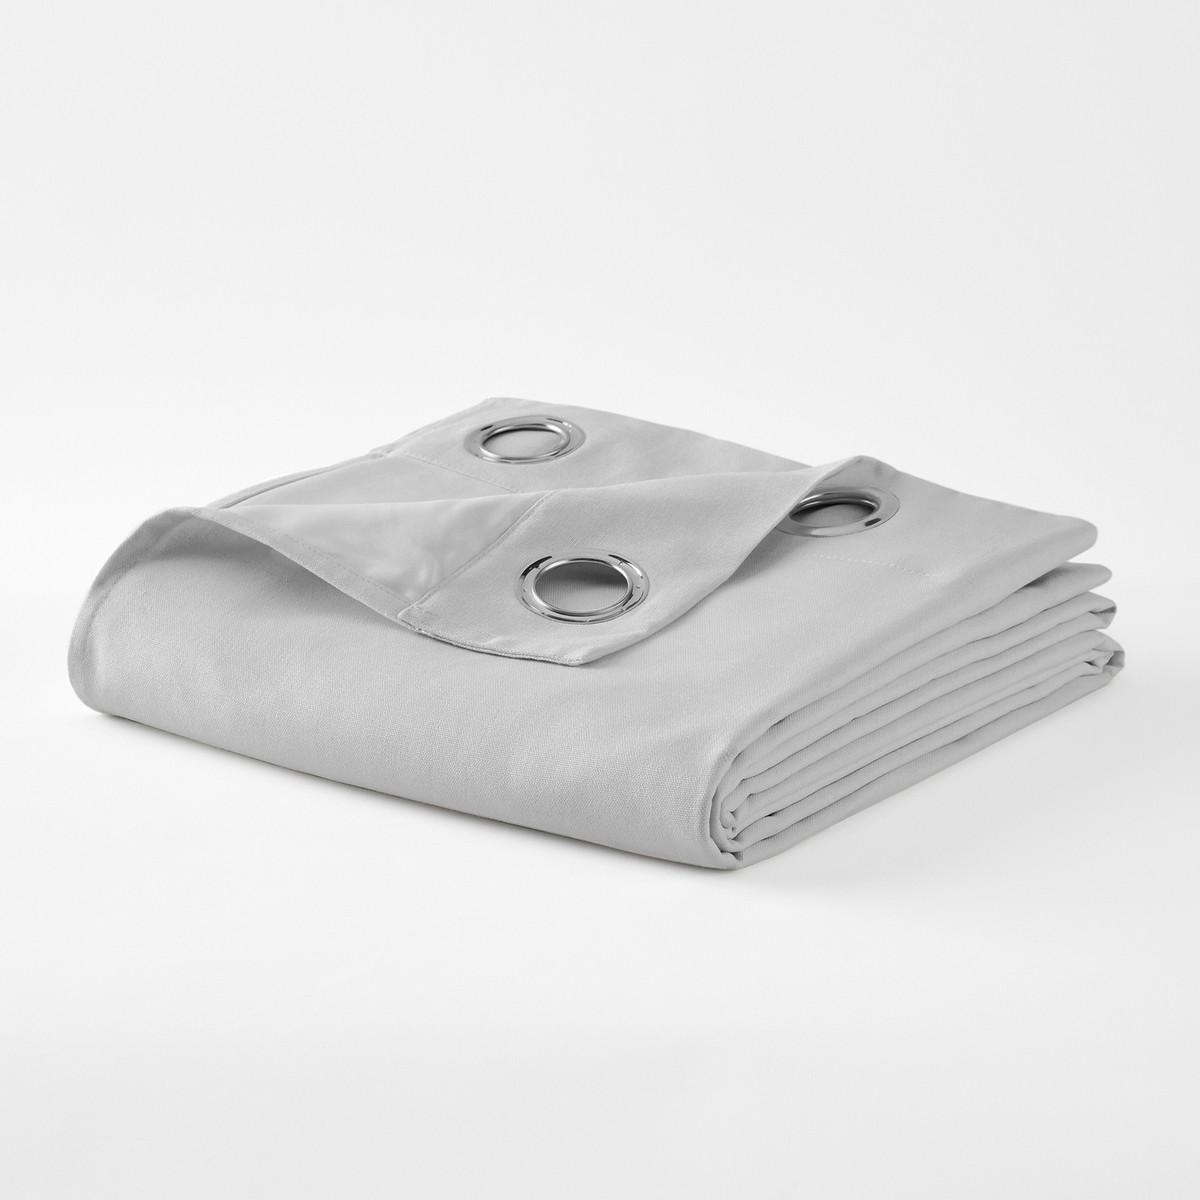 Taima リネン/コットンアイレット遮光カーテン